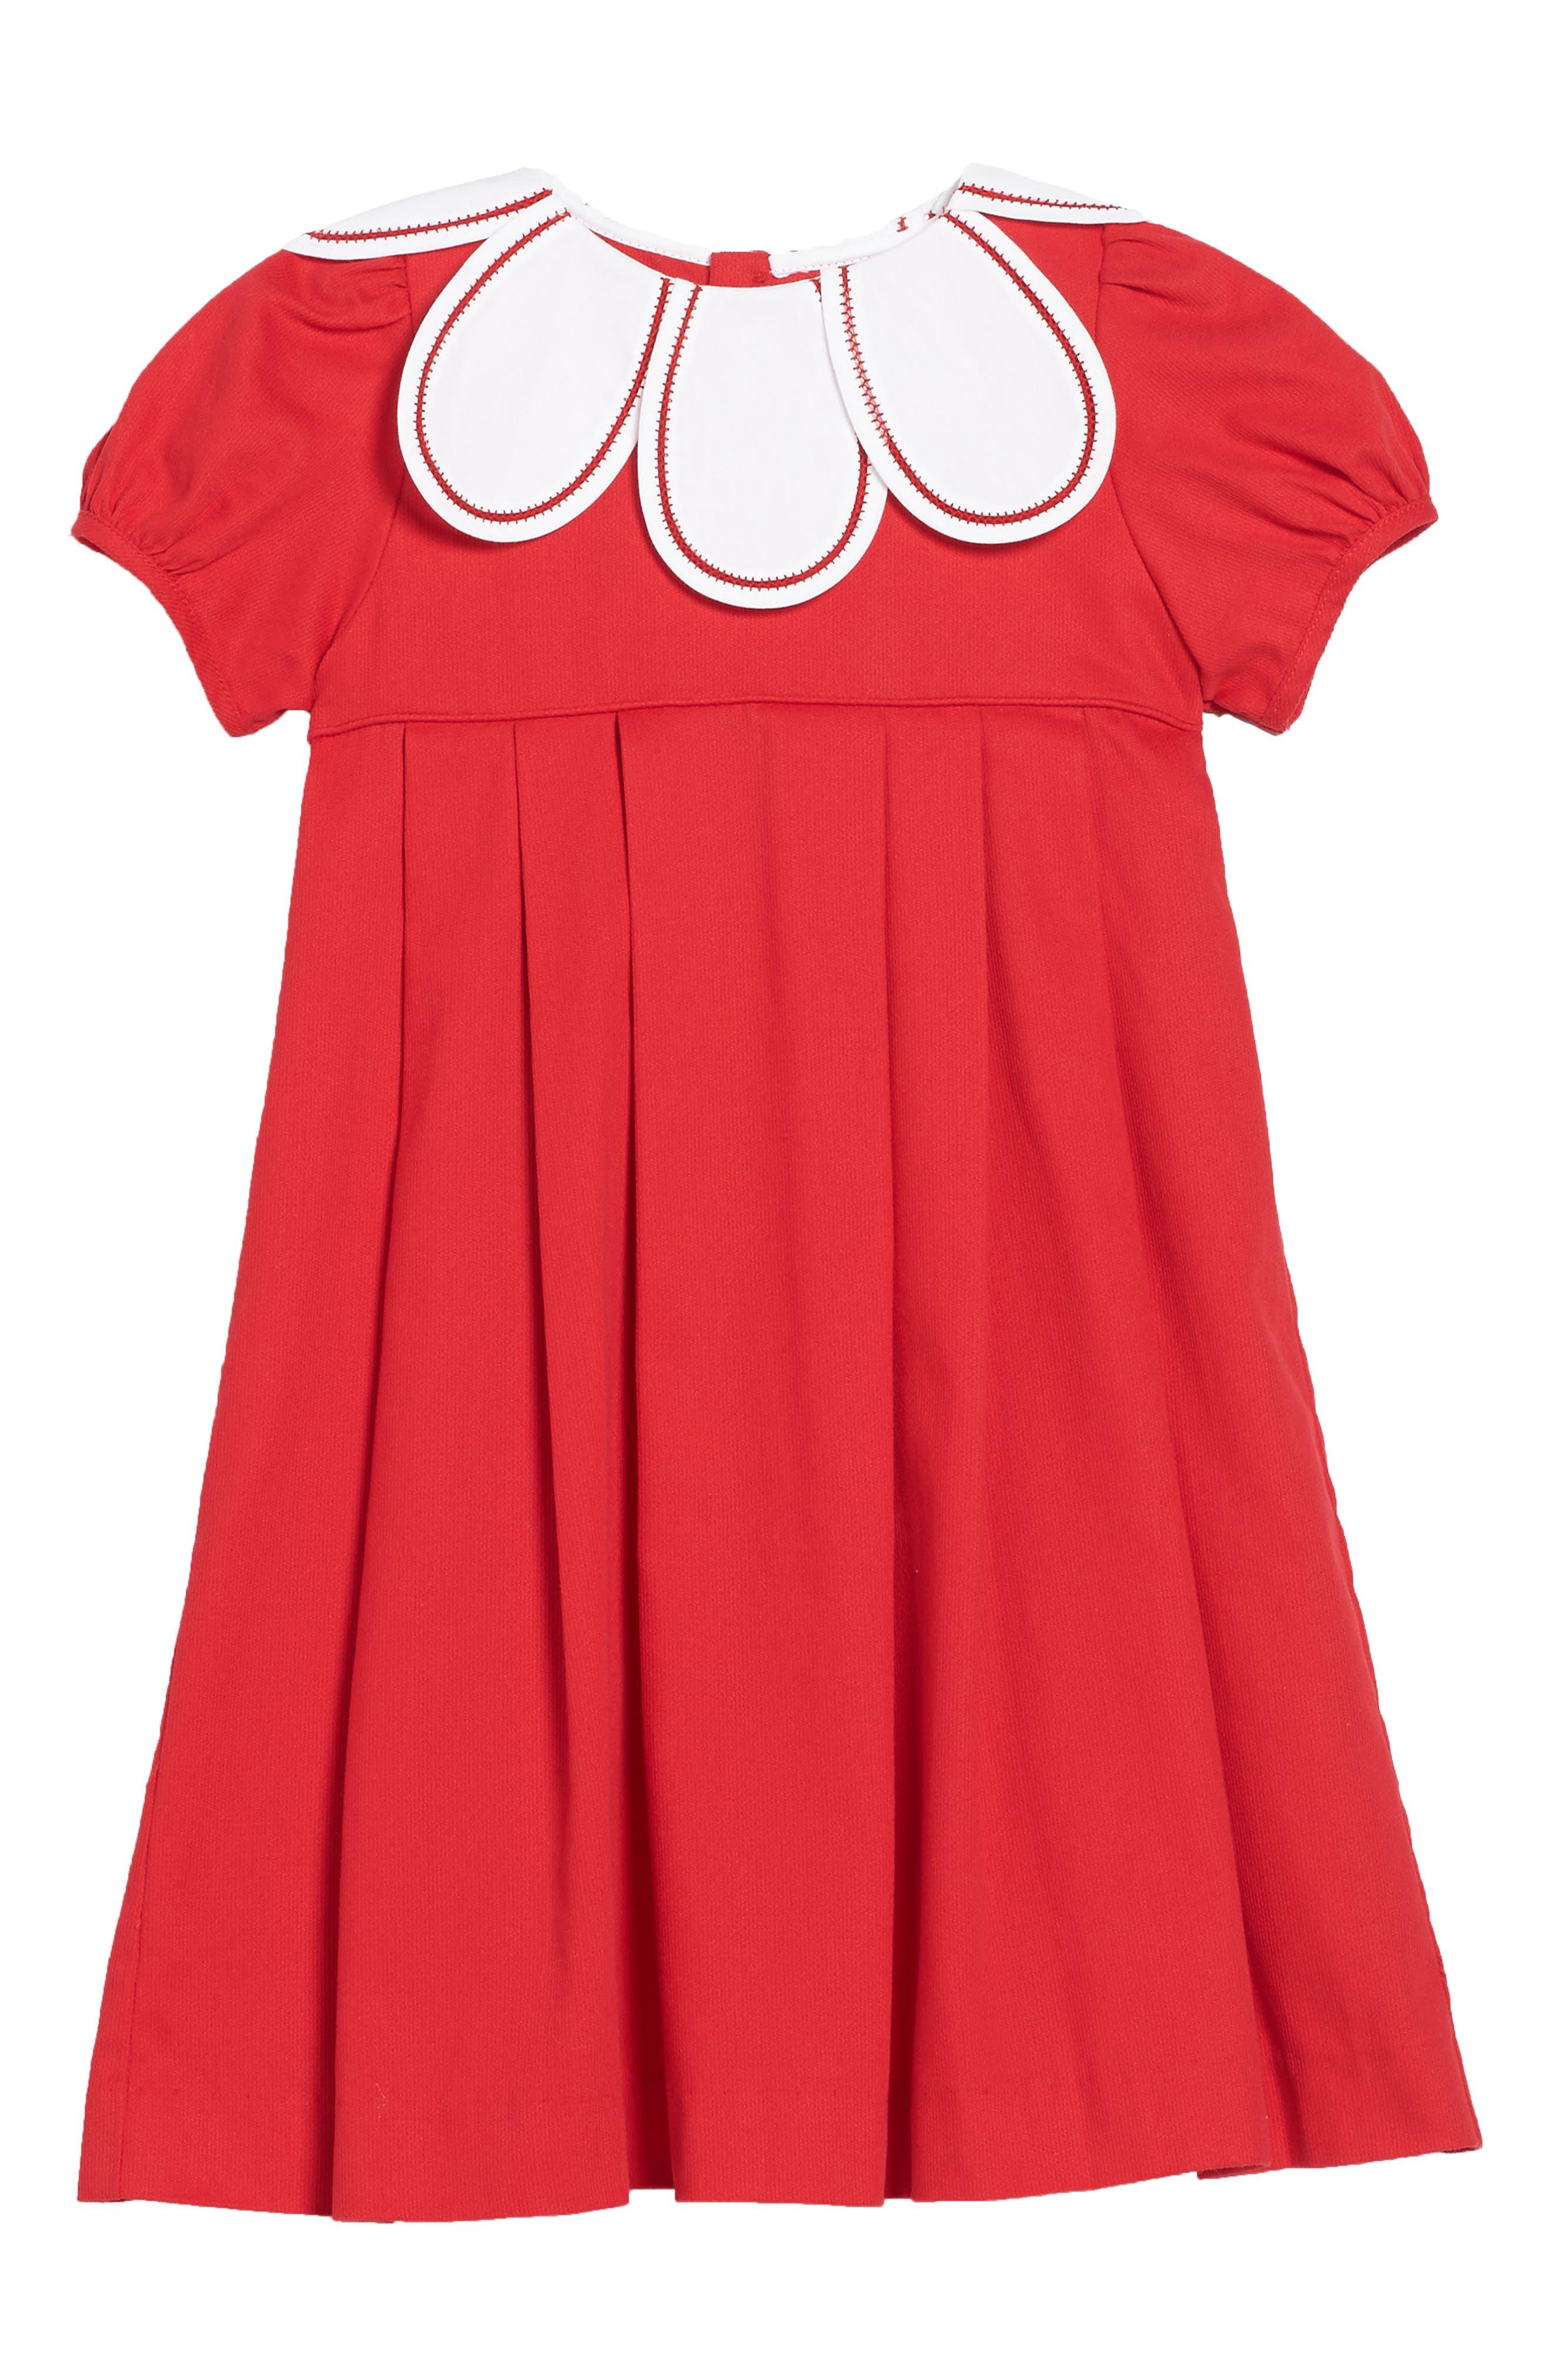 Main Image - Luli & Me Daisy Collar Corduroy Dress (Toddler Girls)